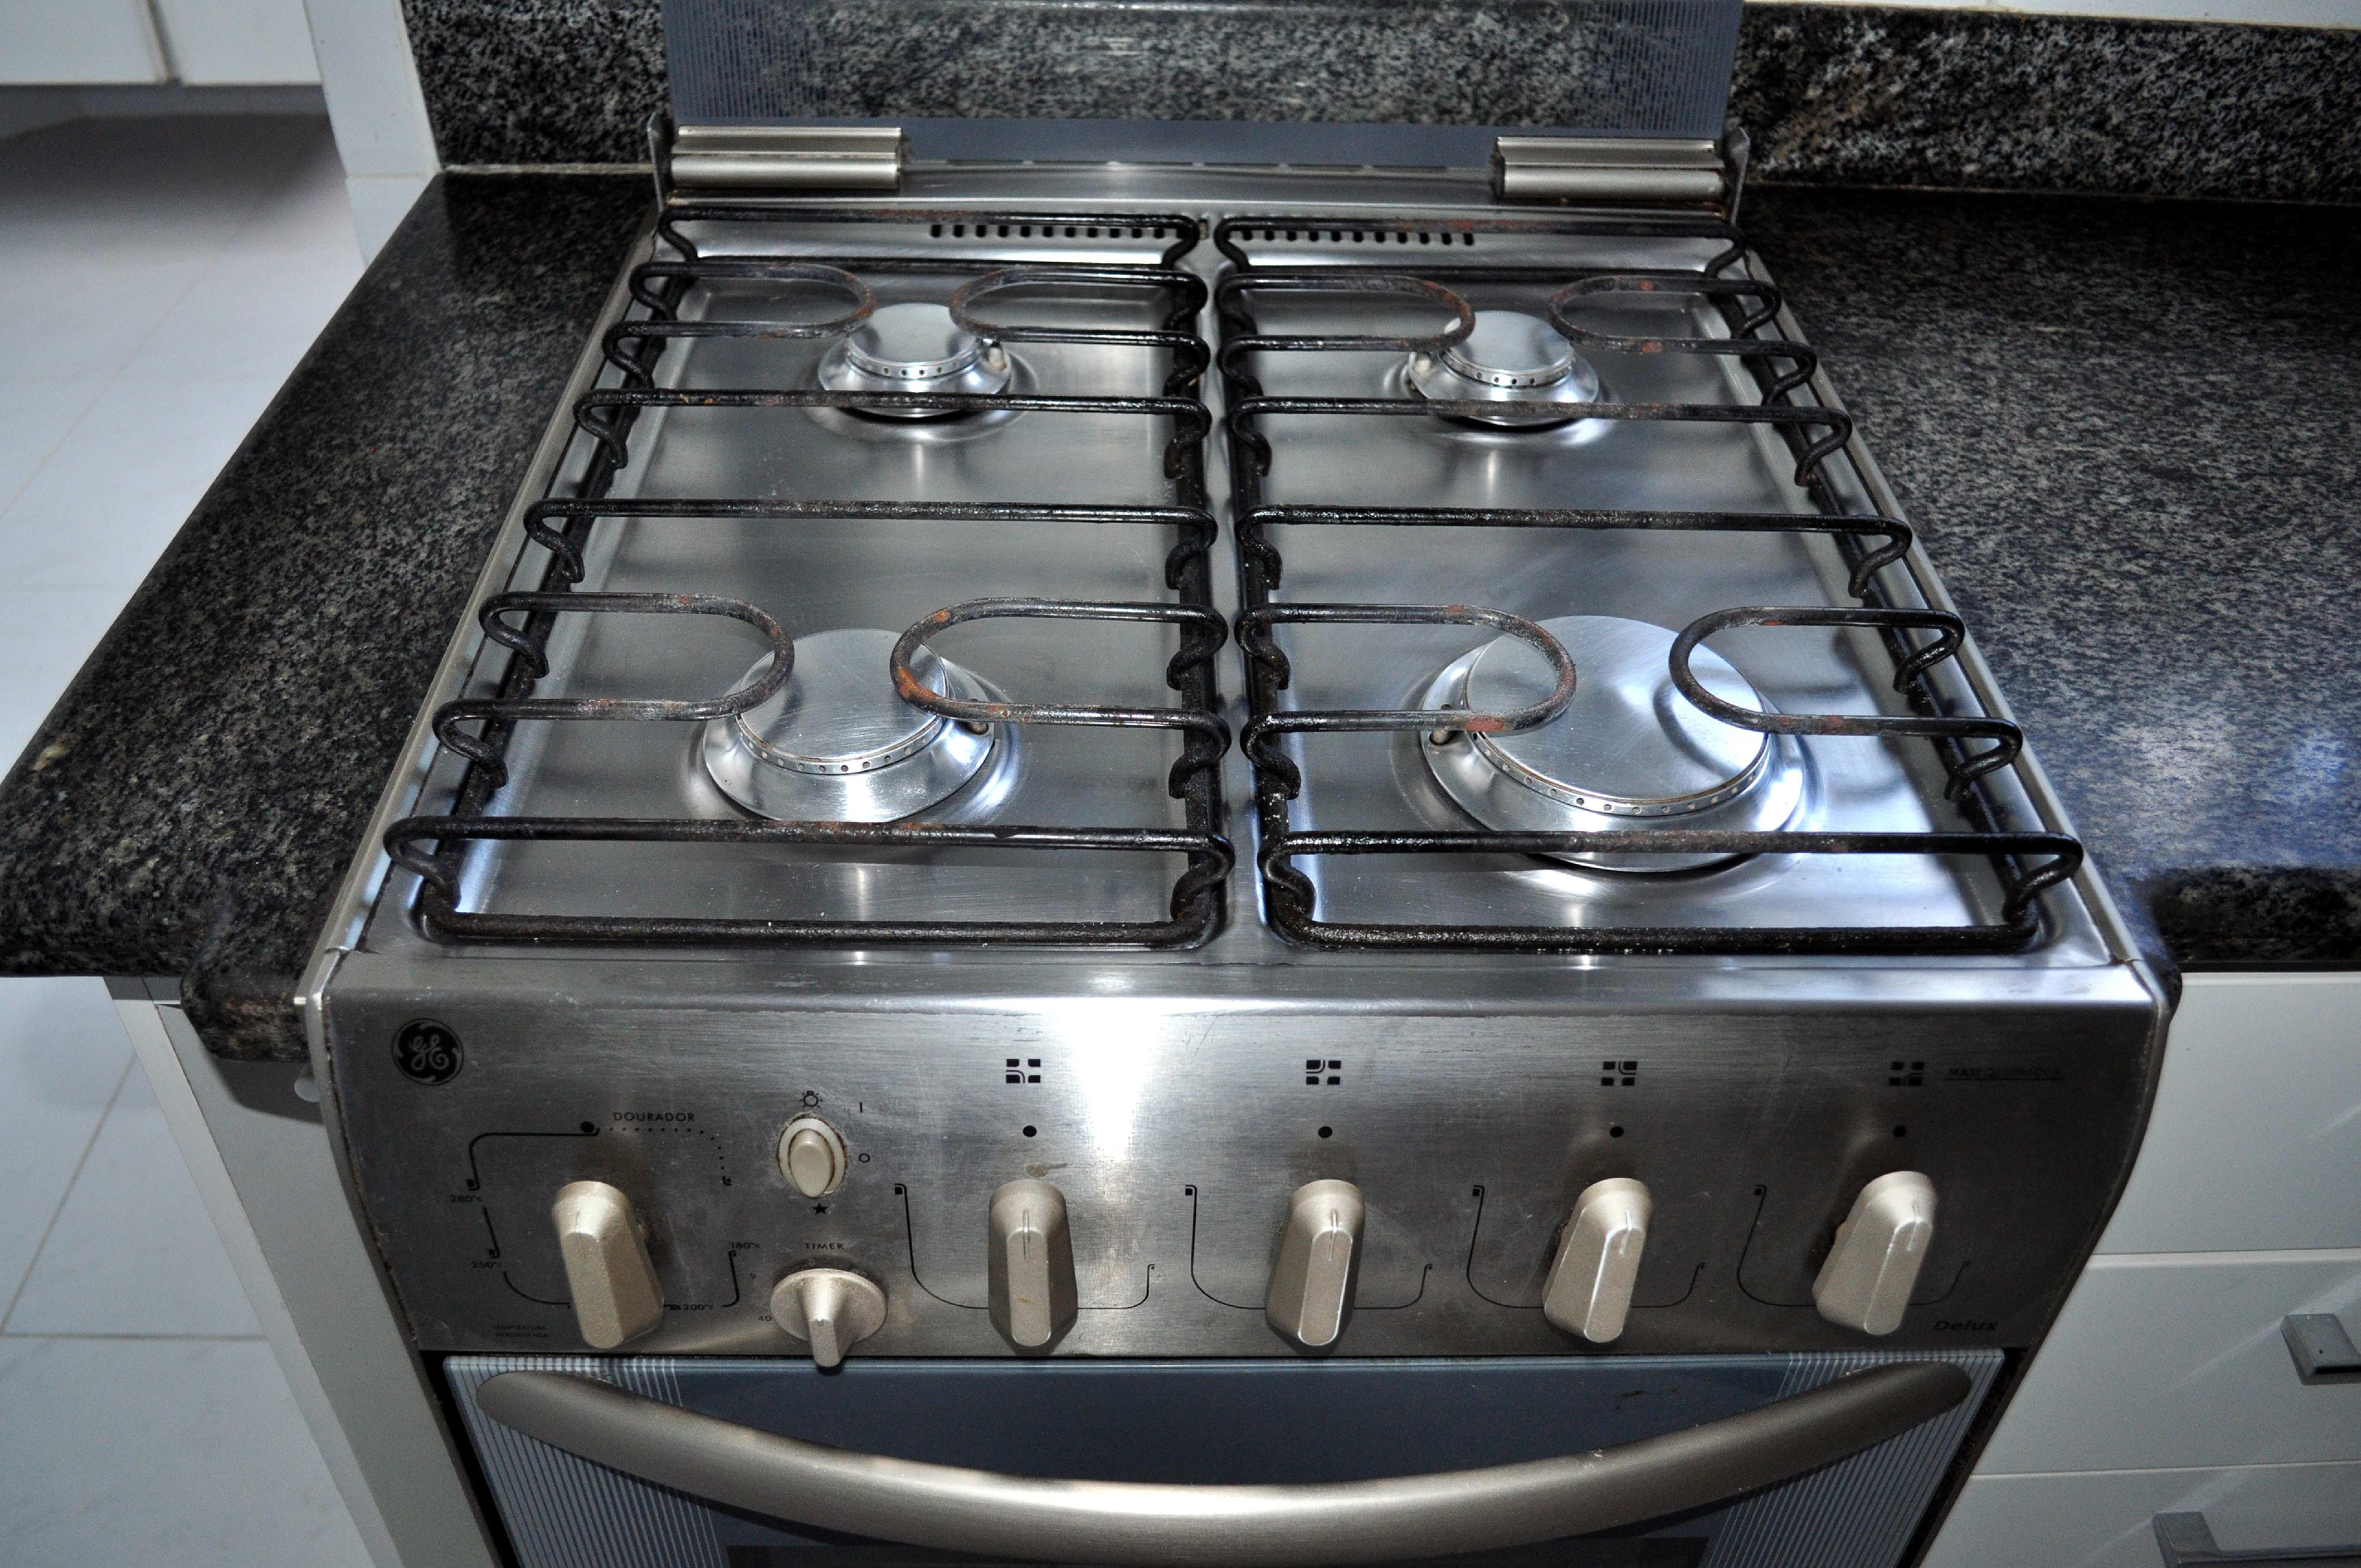 Free photograph; kitchen, gas, stove, close